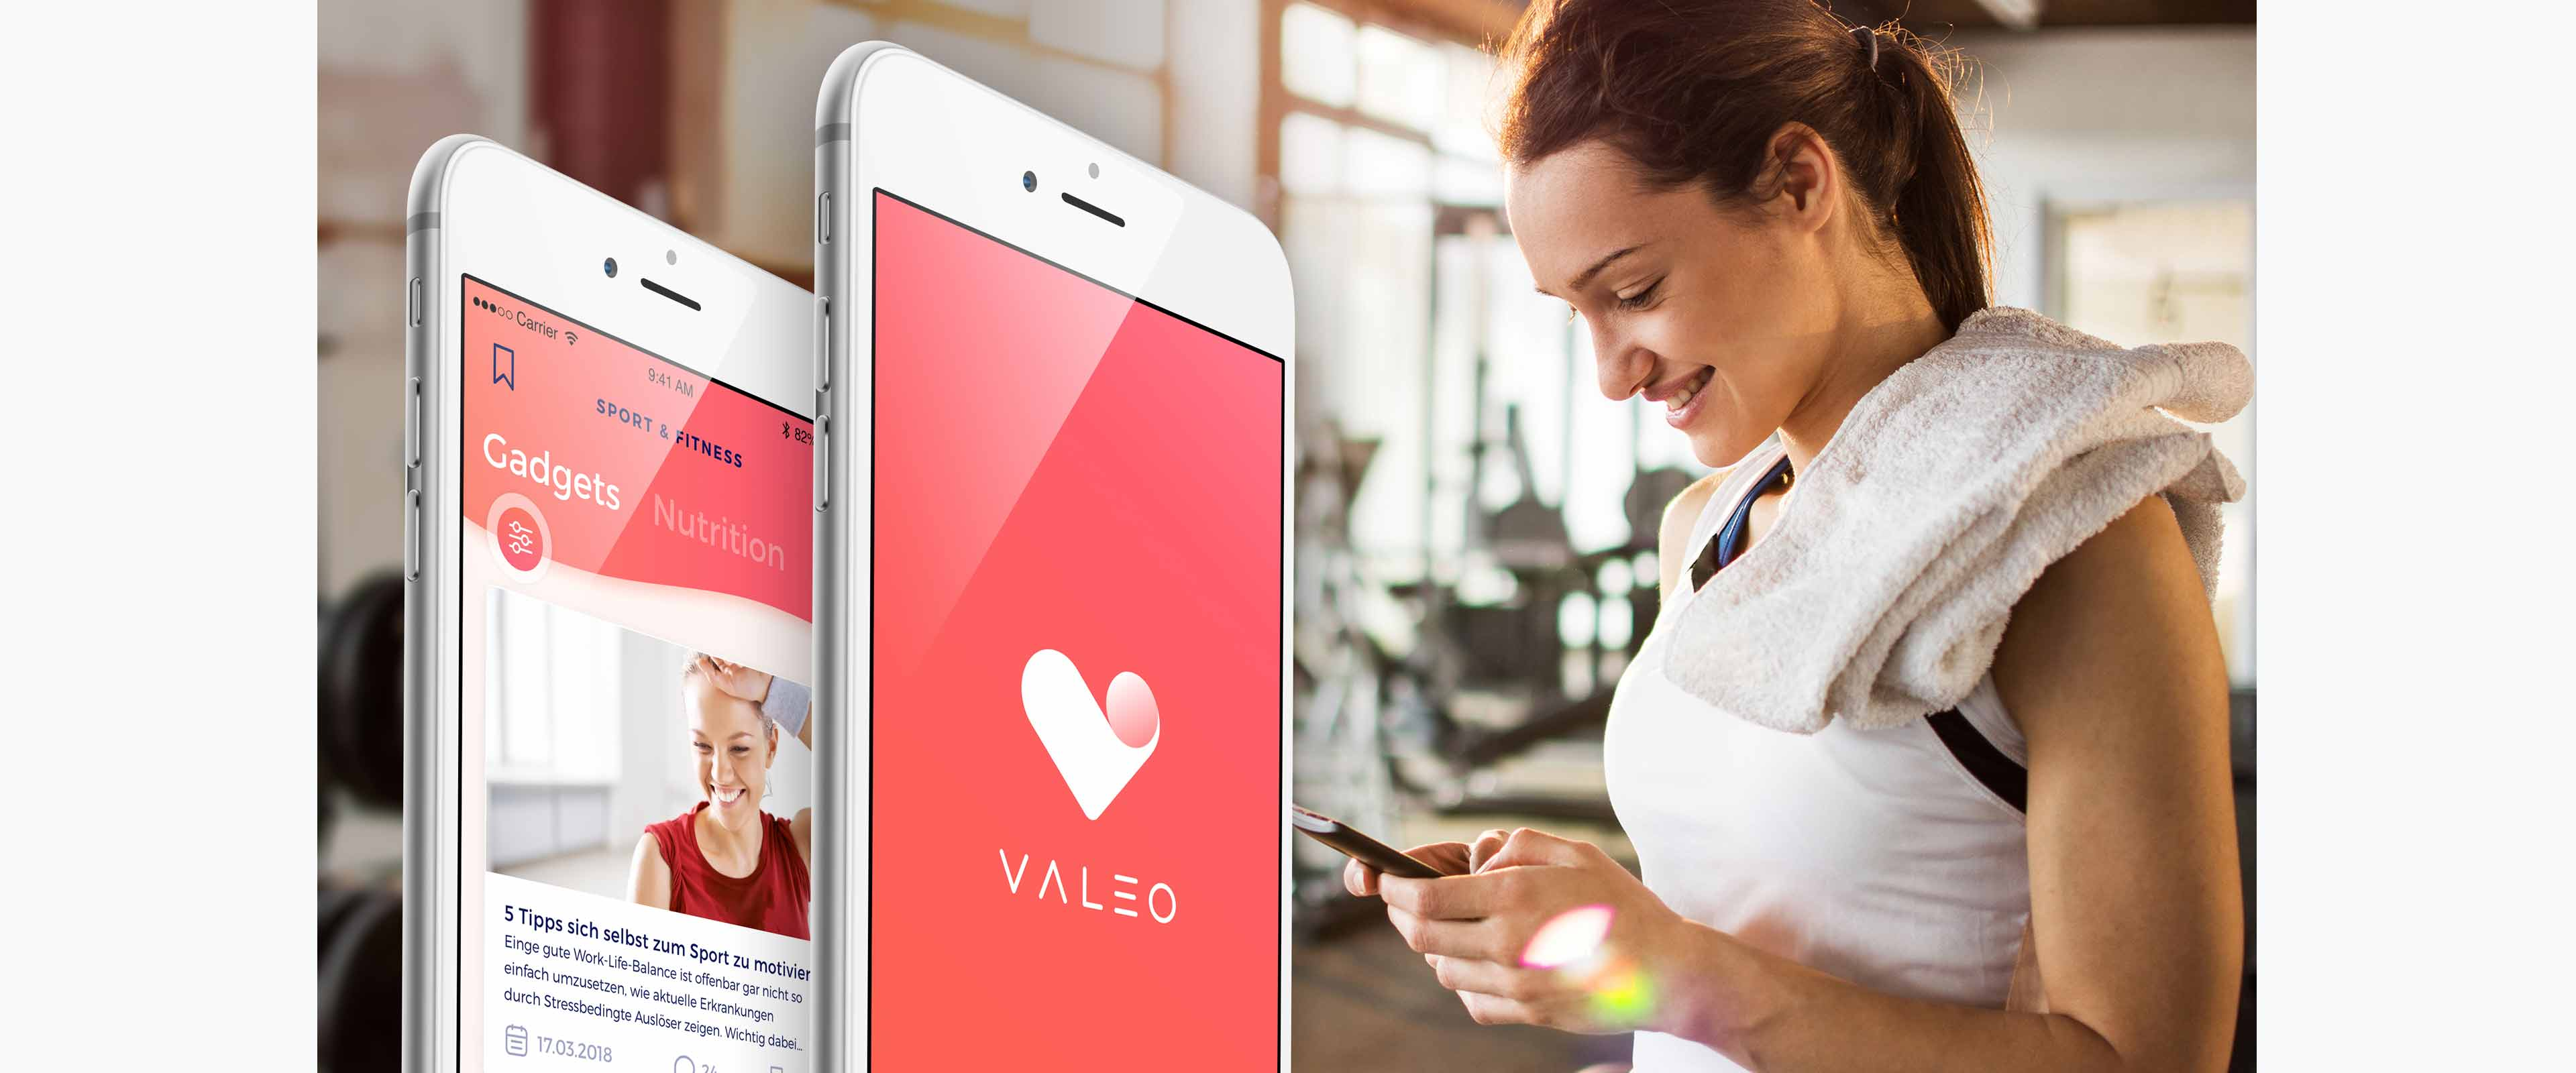 valeo-app-gesundheitsassistent-whatshealth